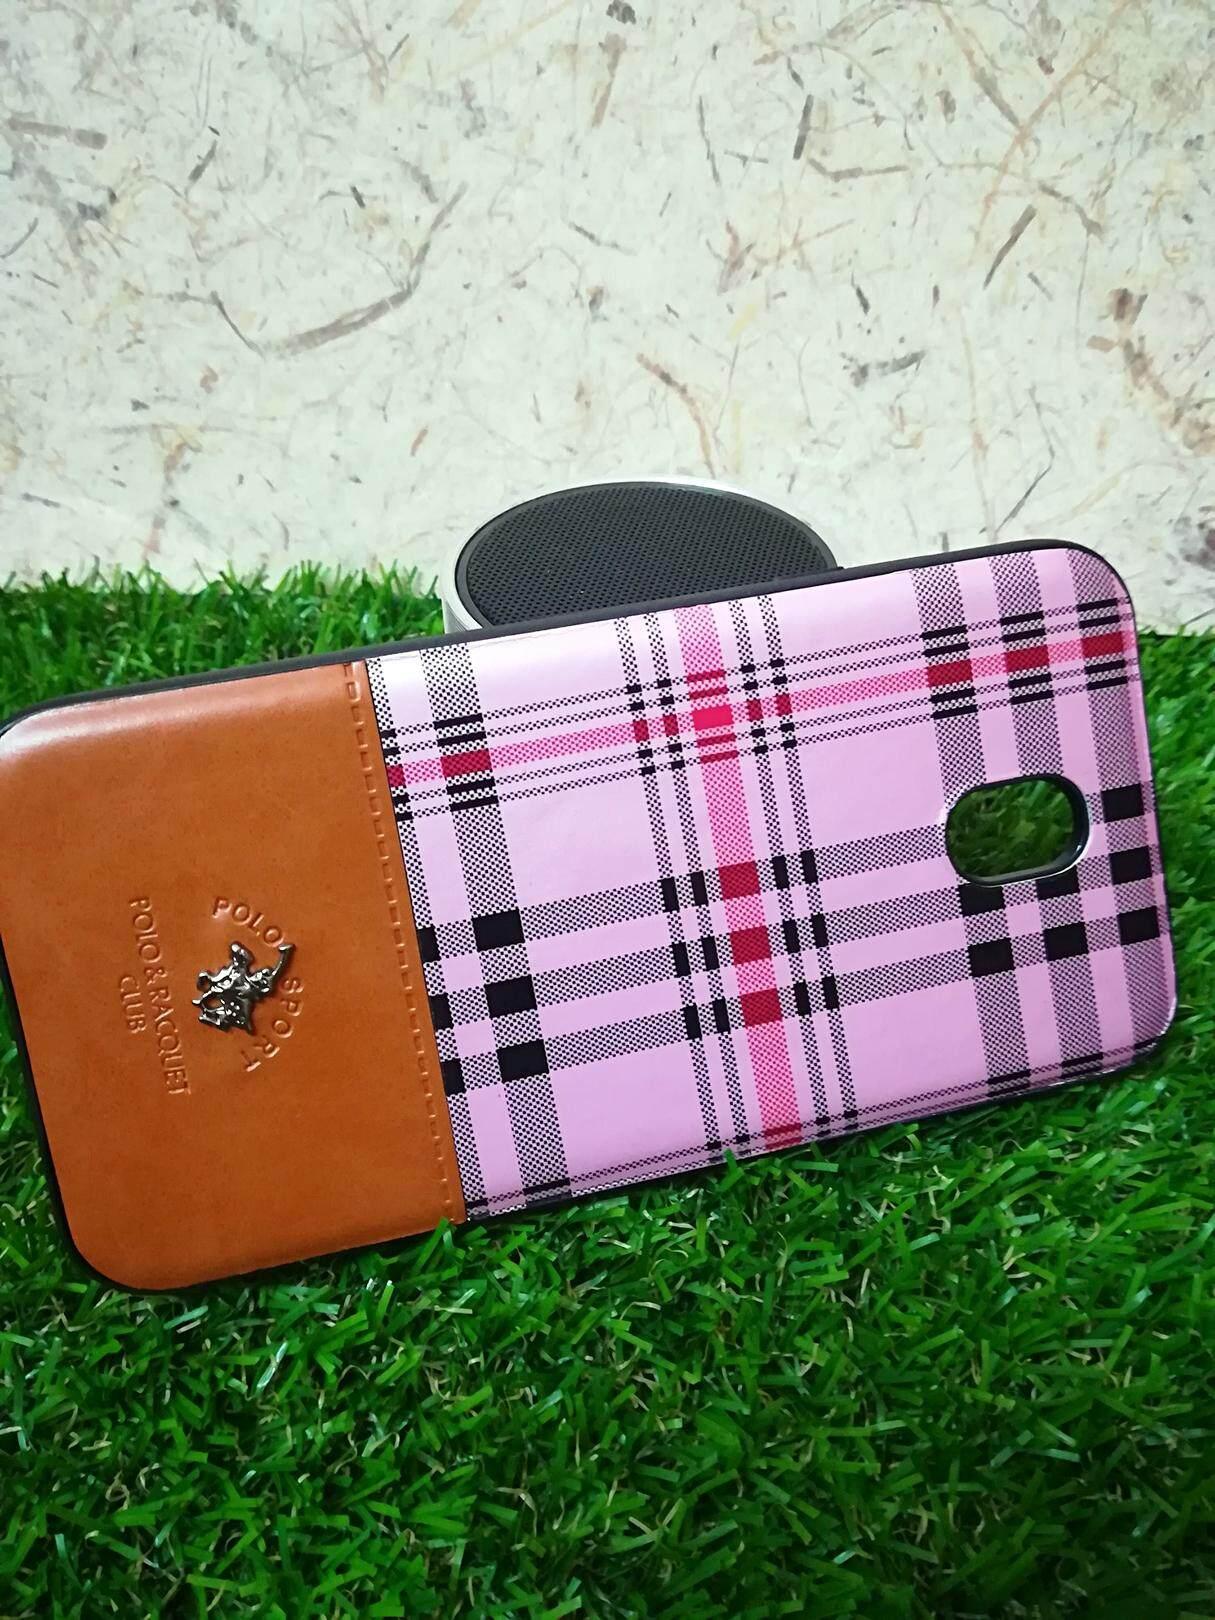 Fashion case polo sport design for Samsung Galaxy j7pro